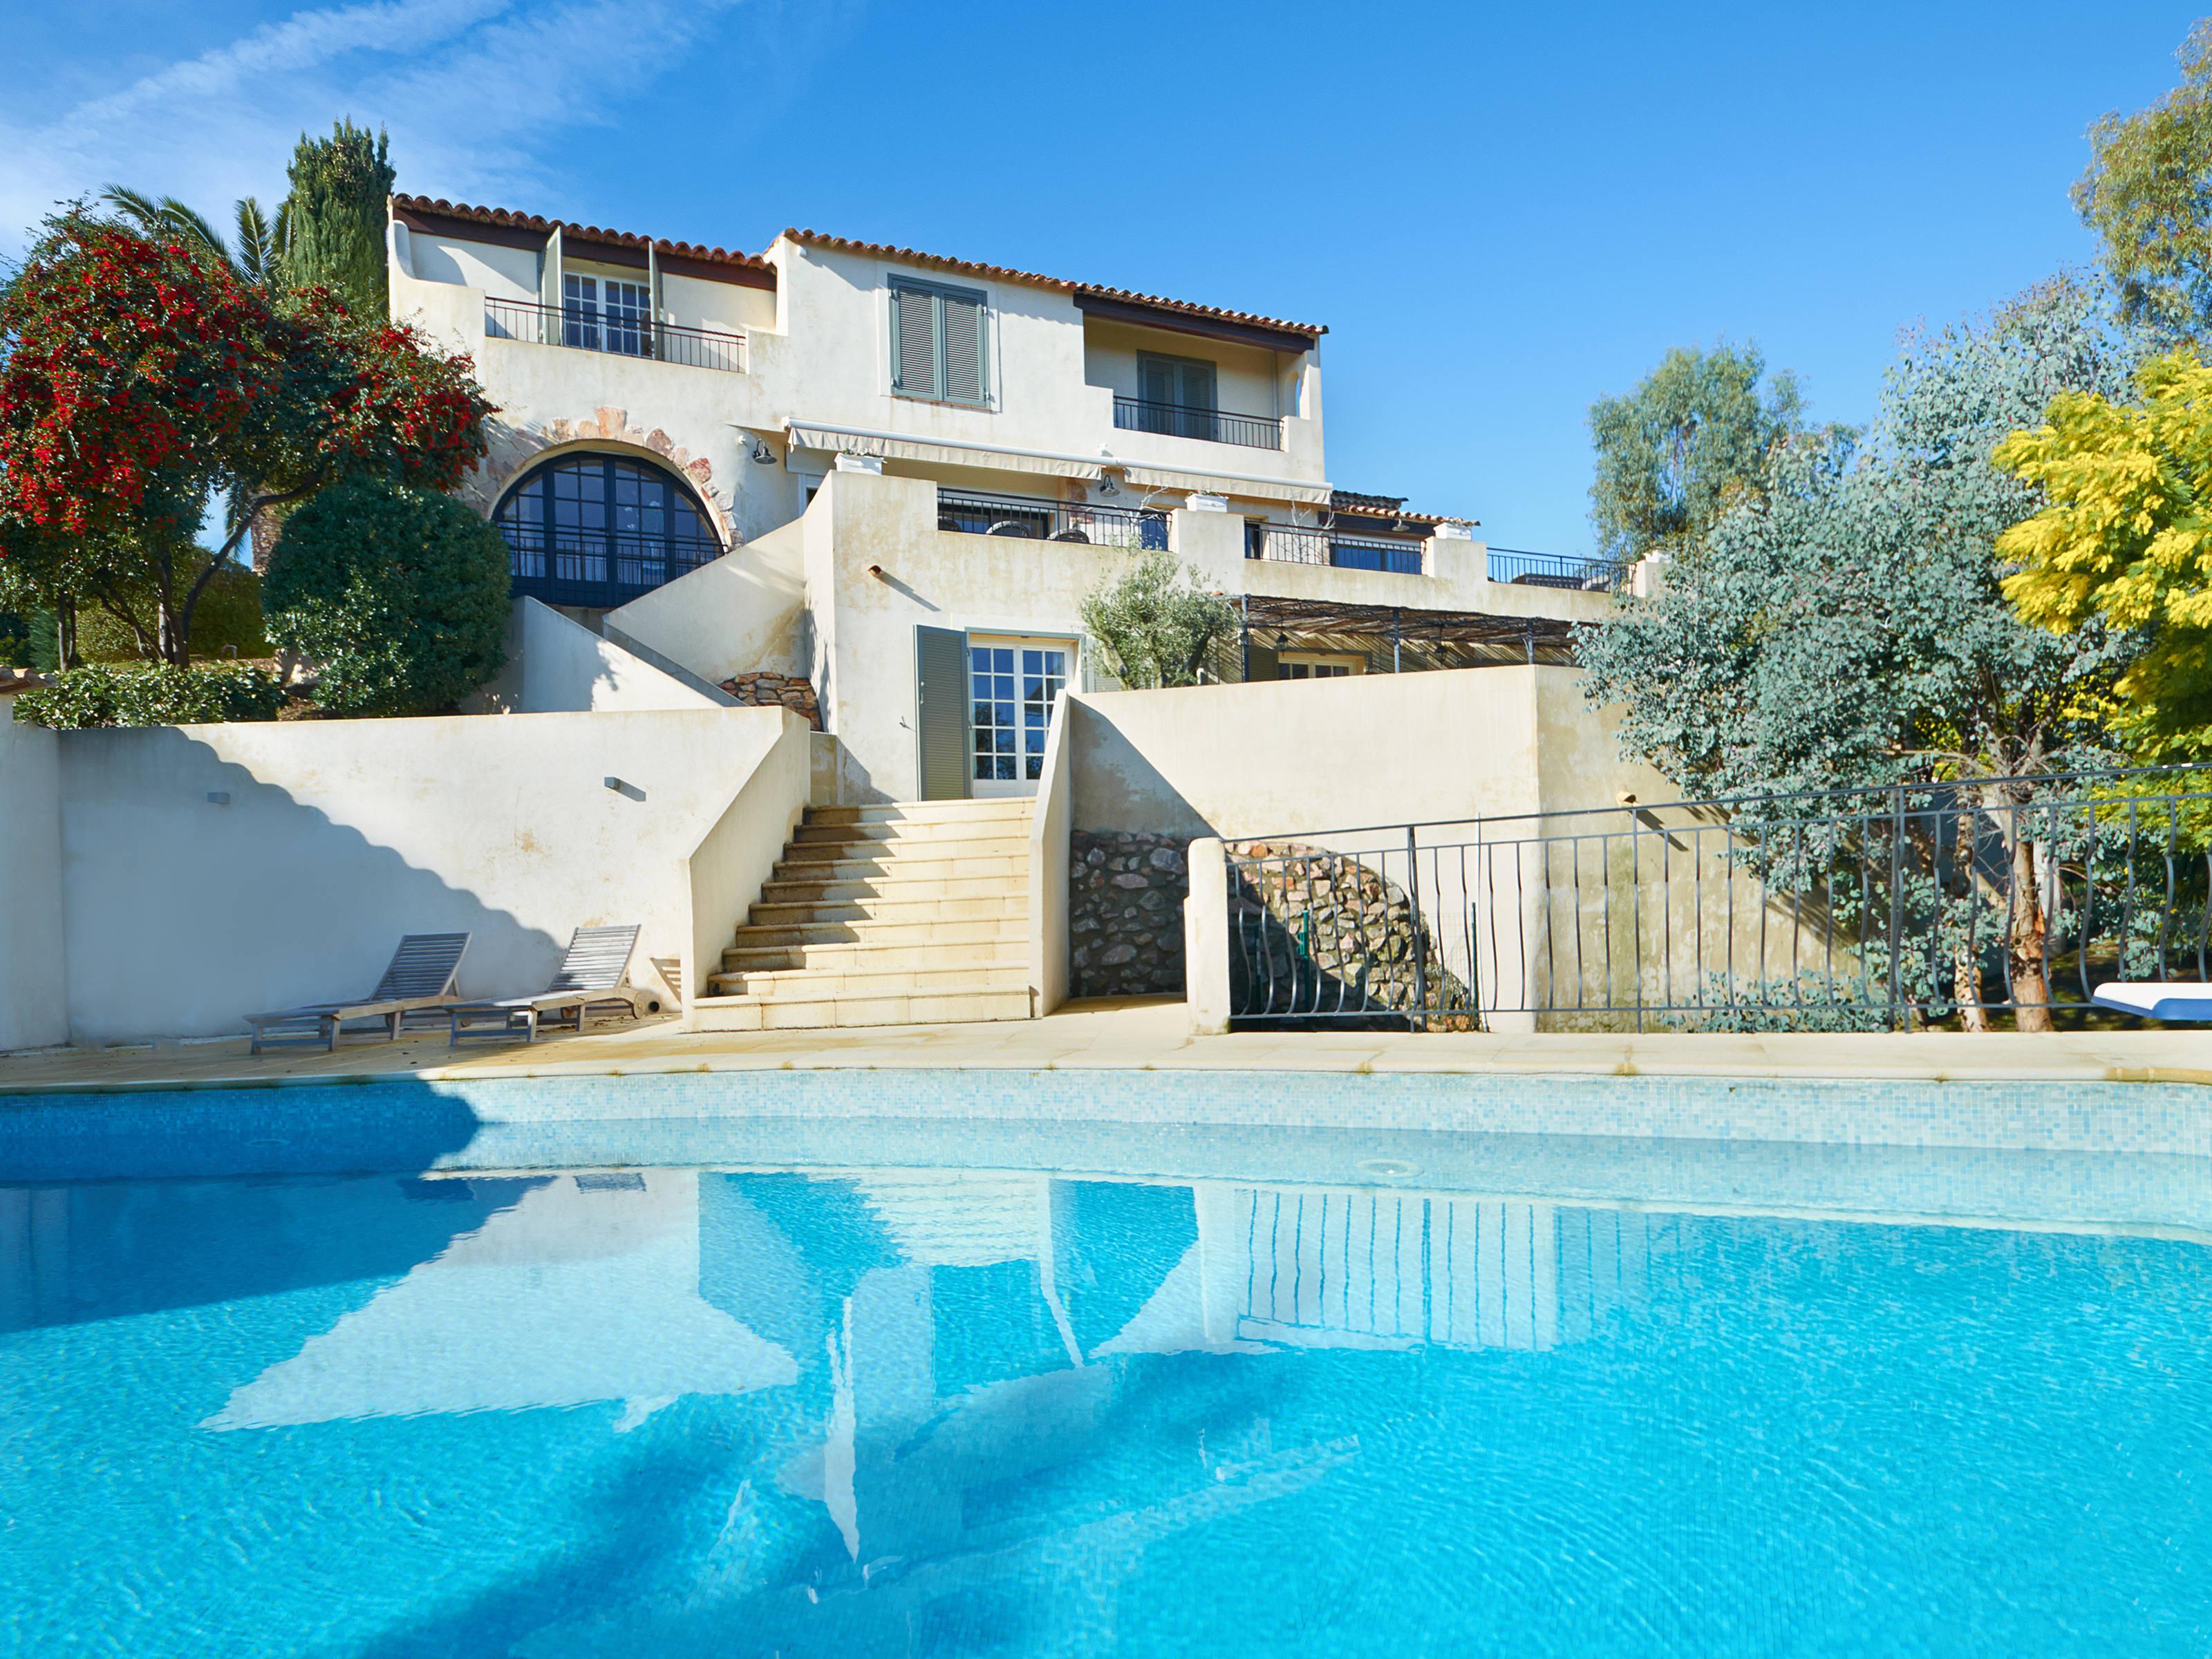 独户住宅 为 销售 在 Super Cannes - Private estate - luxury renovated villa with sea view Cannes, 普罗旺斯阿尔卑斯蓝色海岸 06400 法国